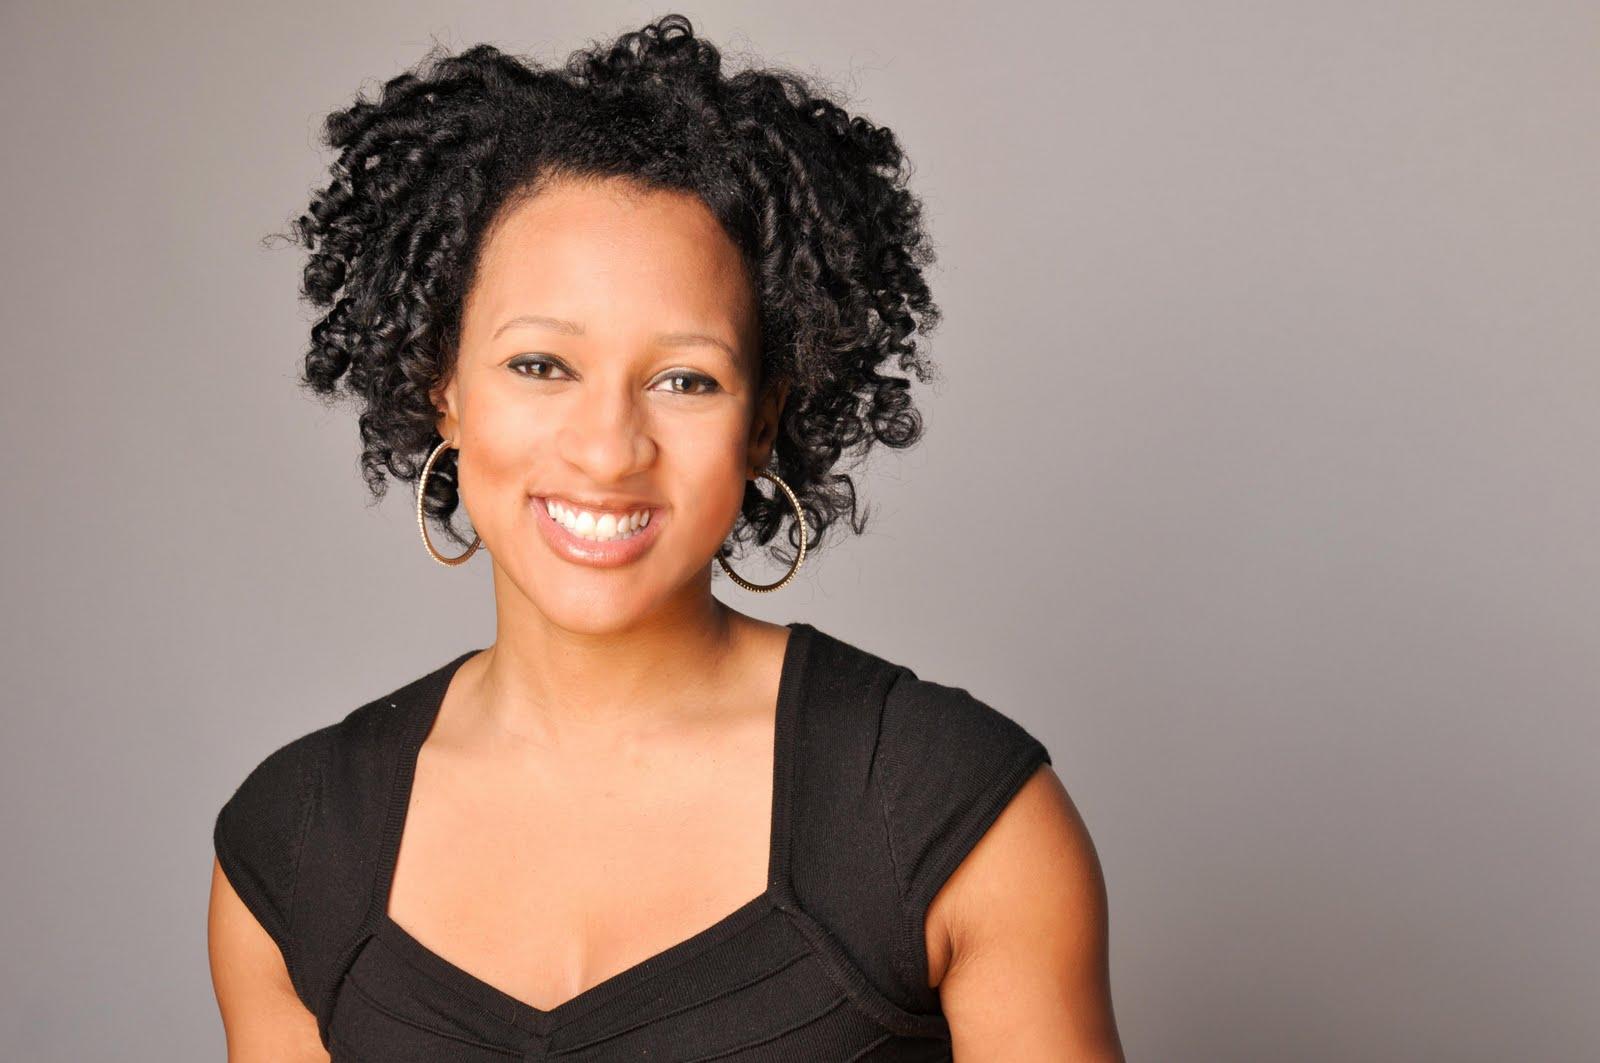 Short Hairstyles For Black Women Natural Hair